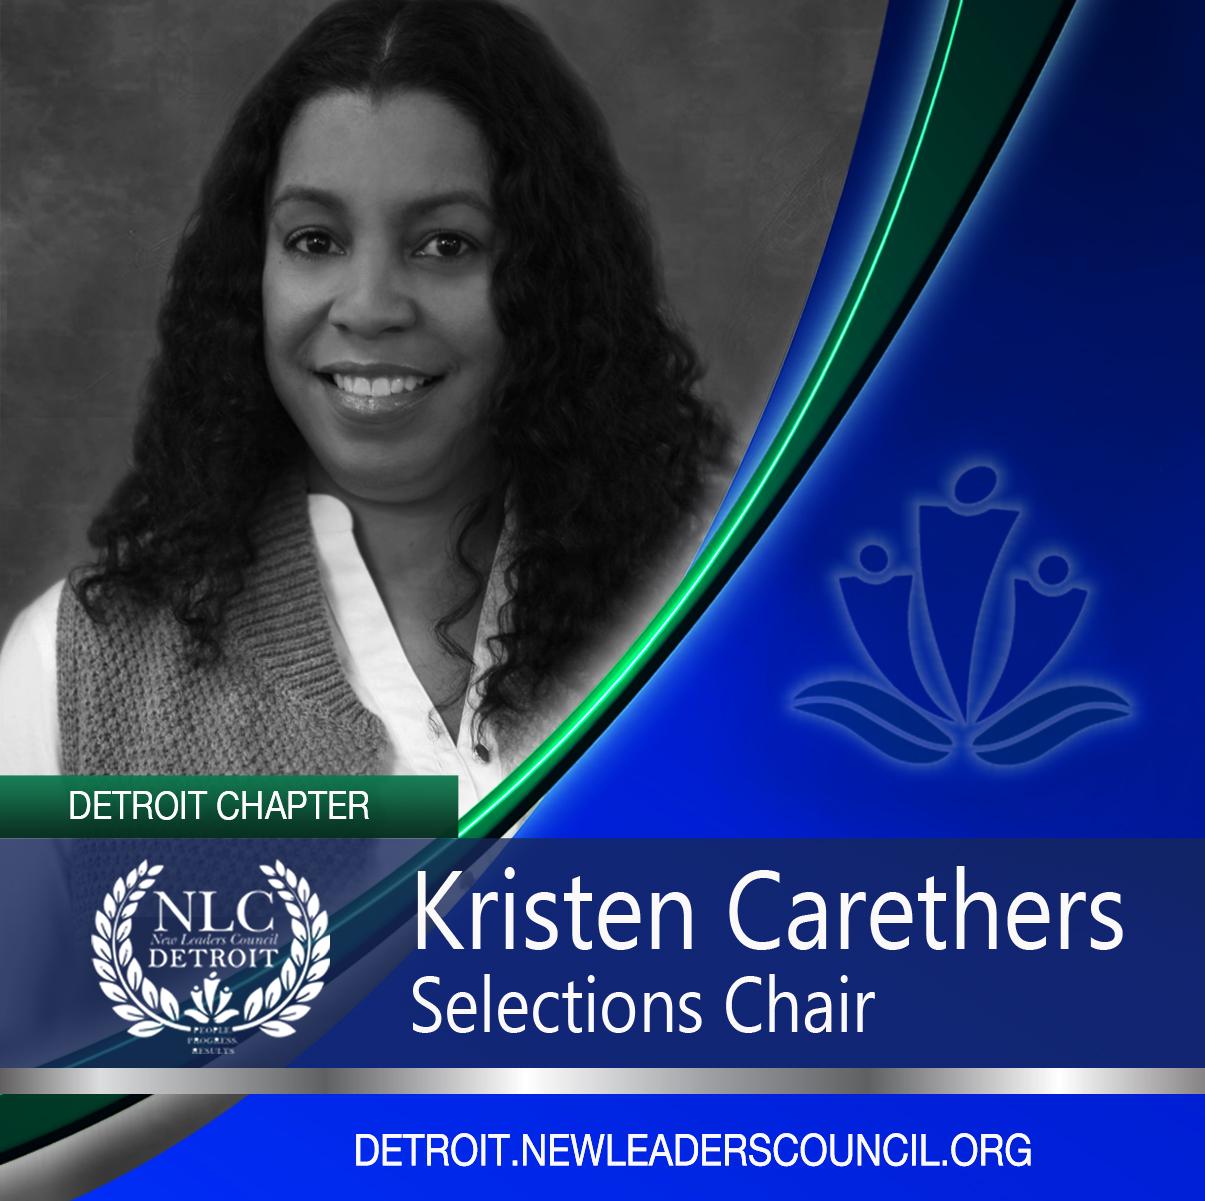 KristenCarethers_SelectionsChair.jpg